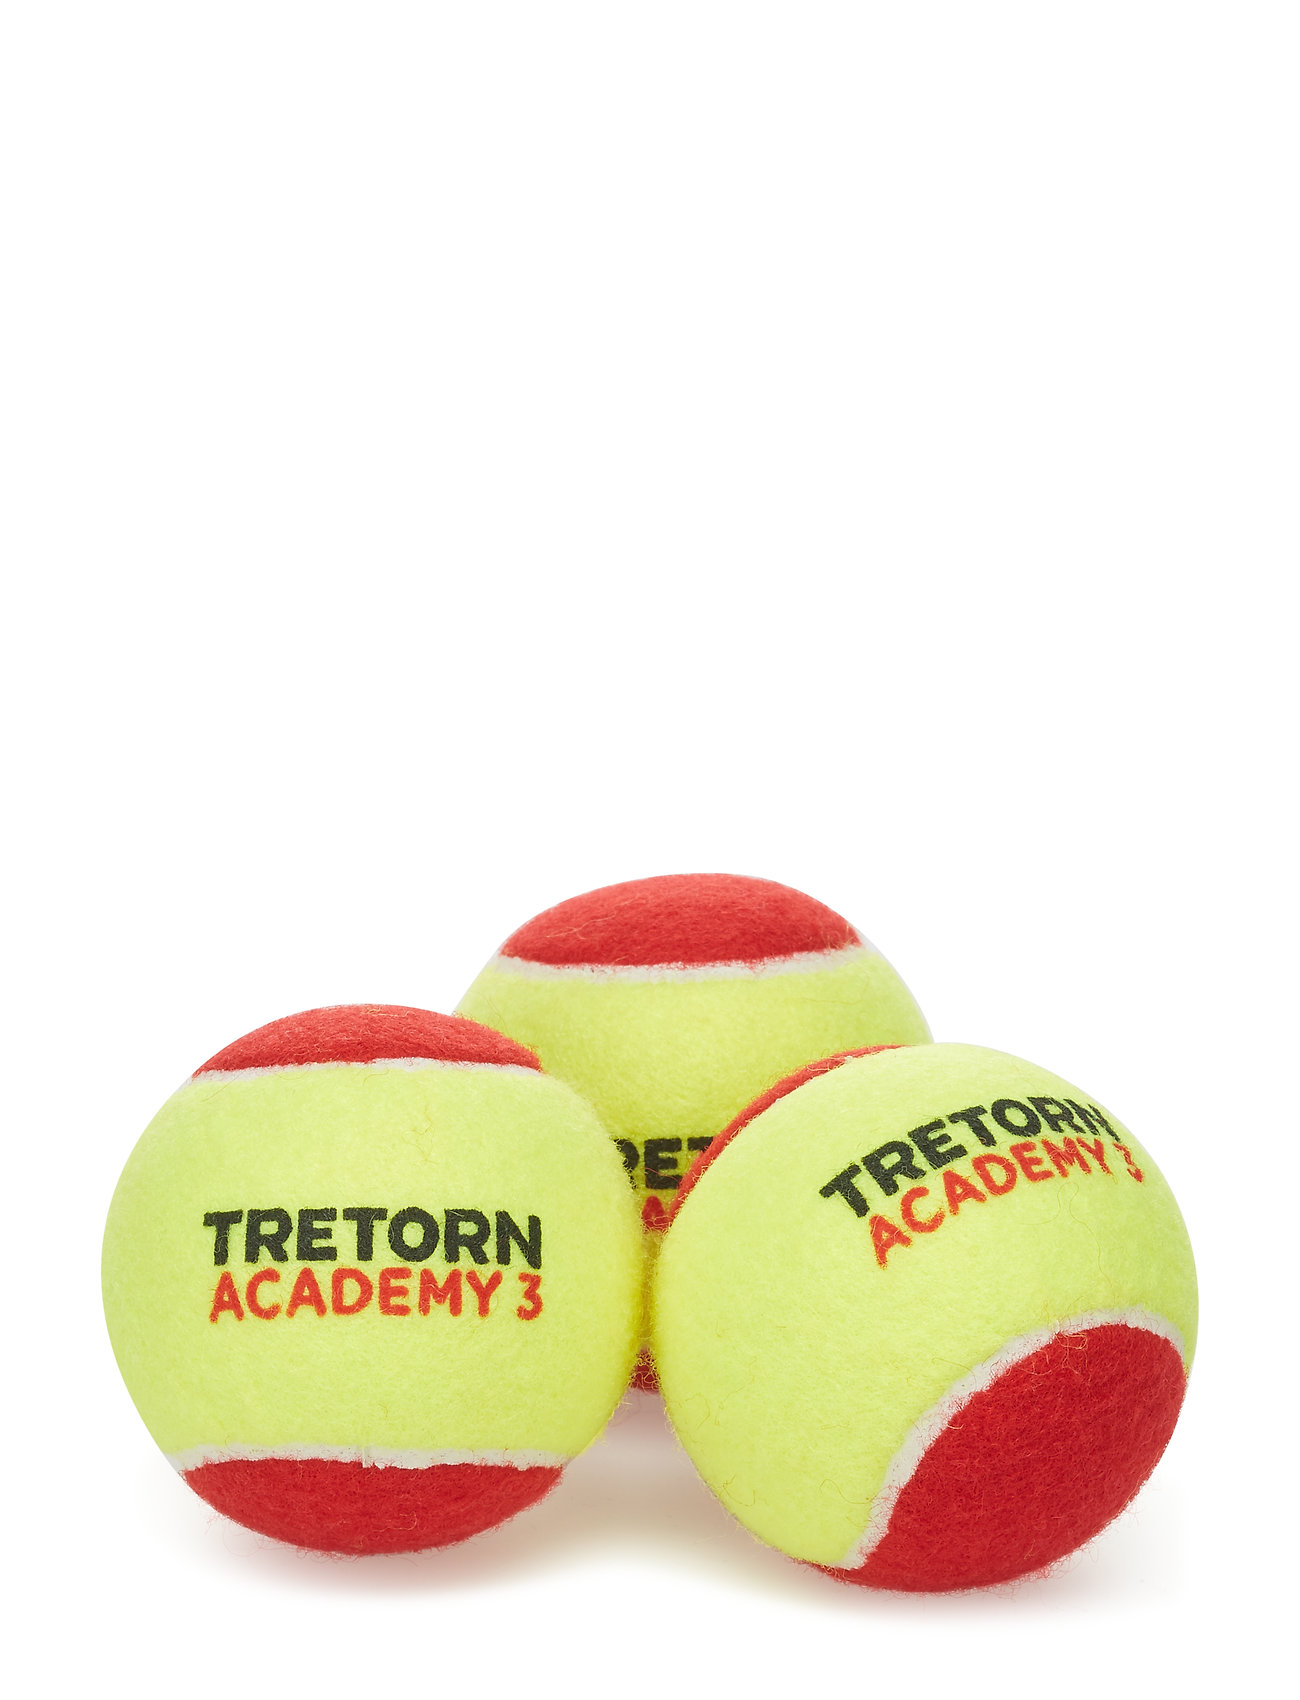 Tretorn Academy Redfelt 3-pack edfae64873